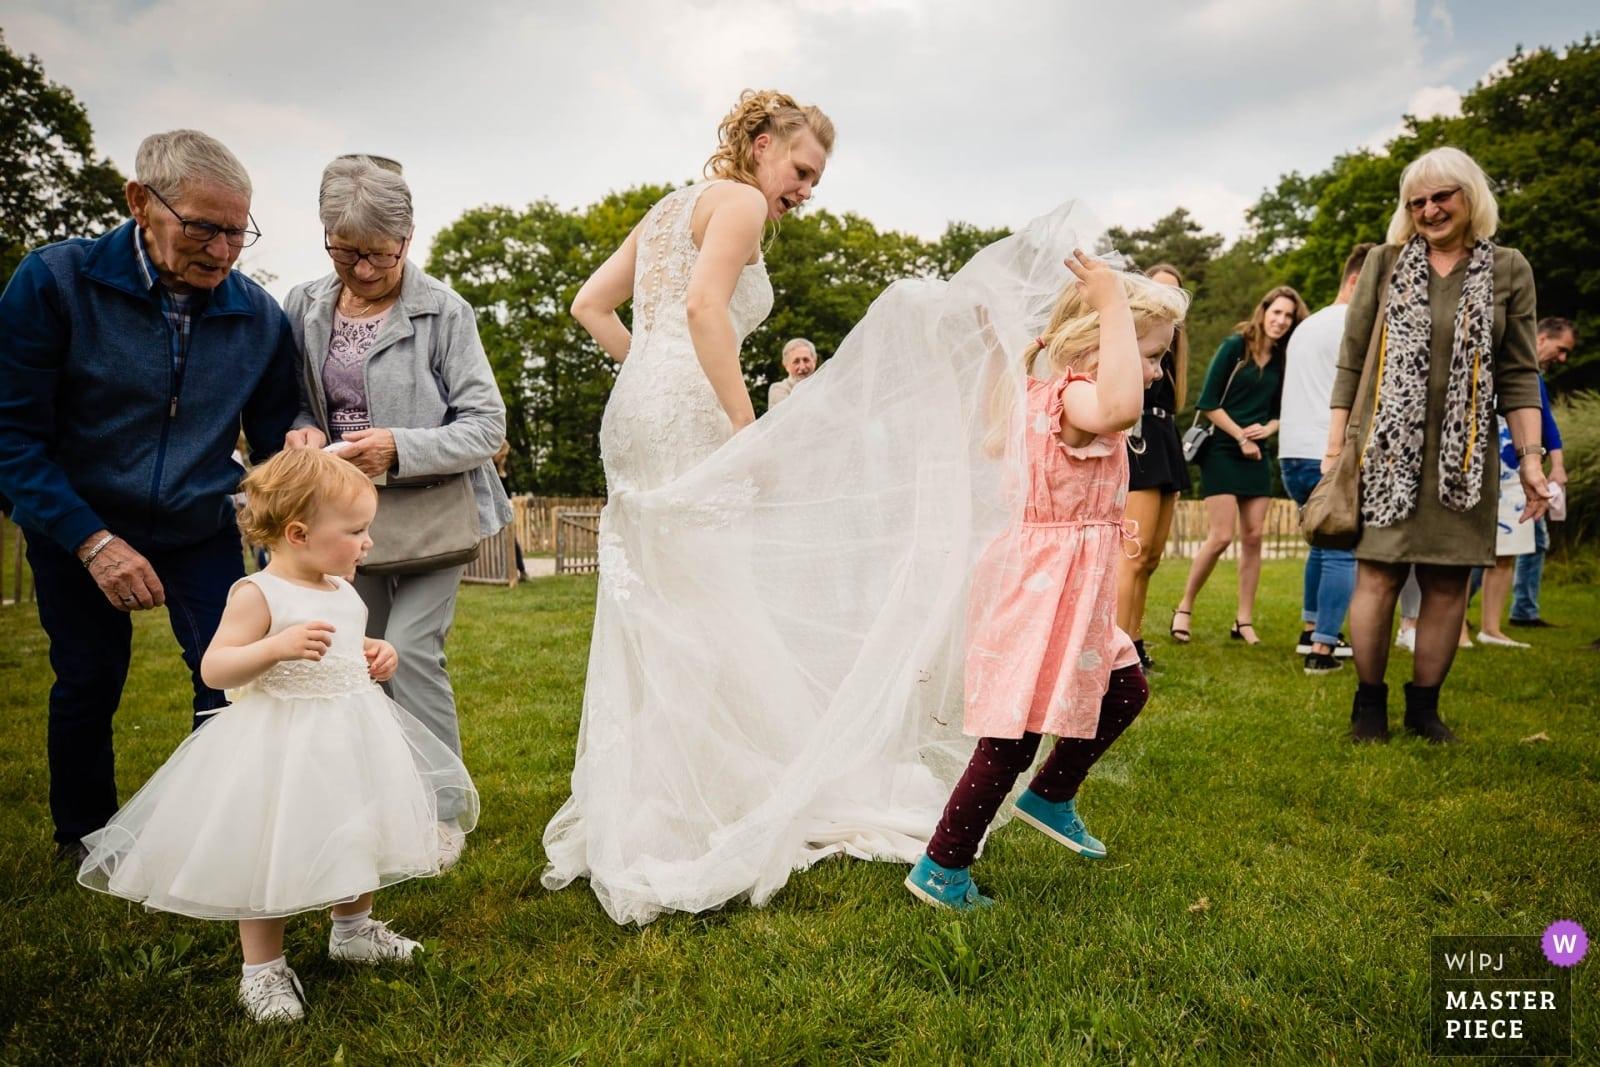 2019v09 wedding-photographer-2536496